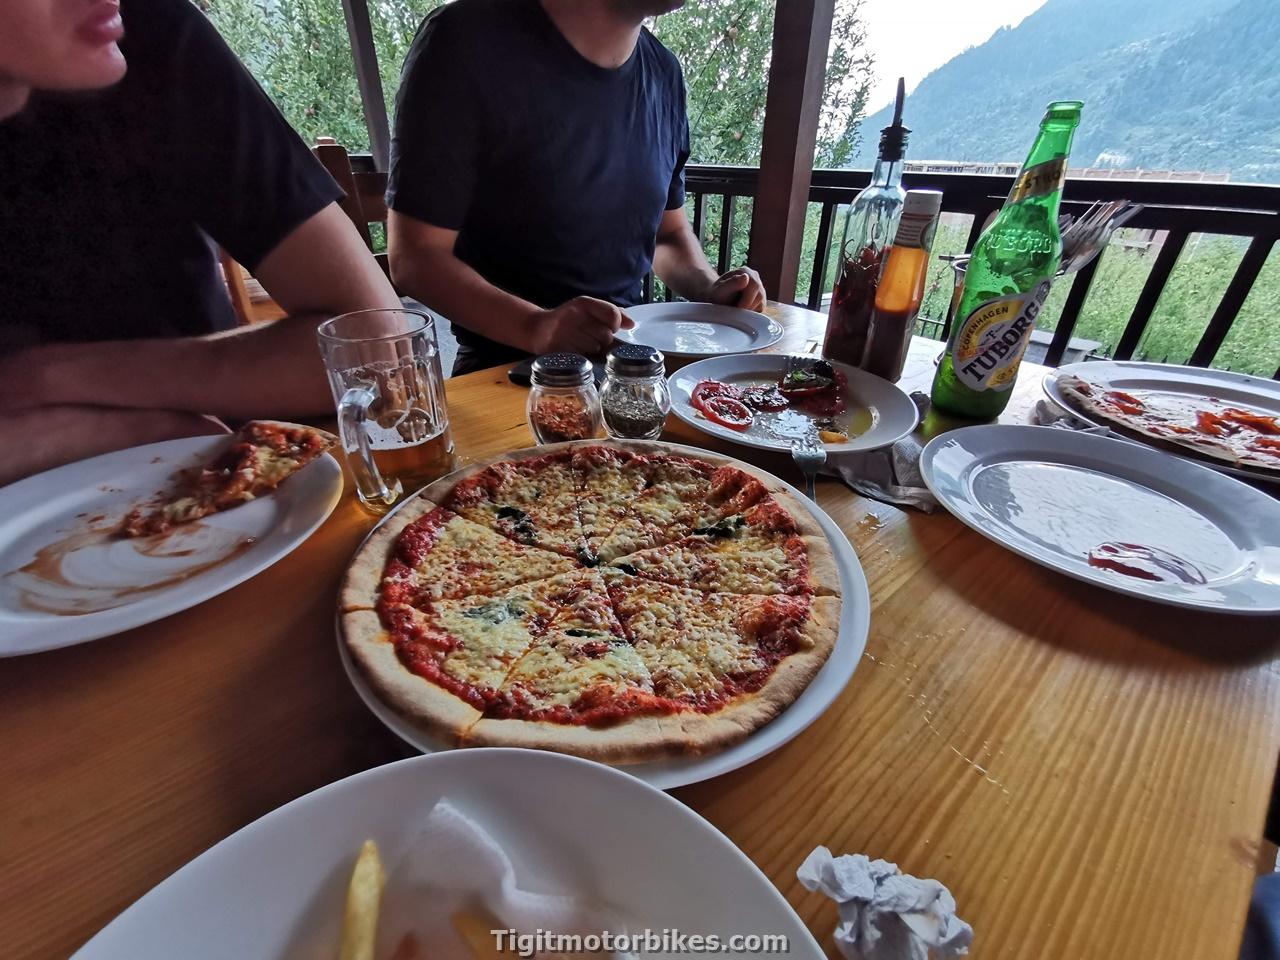 Kashmir Pizza